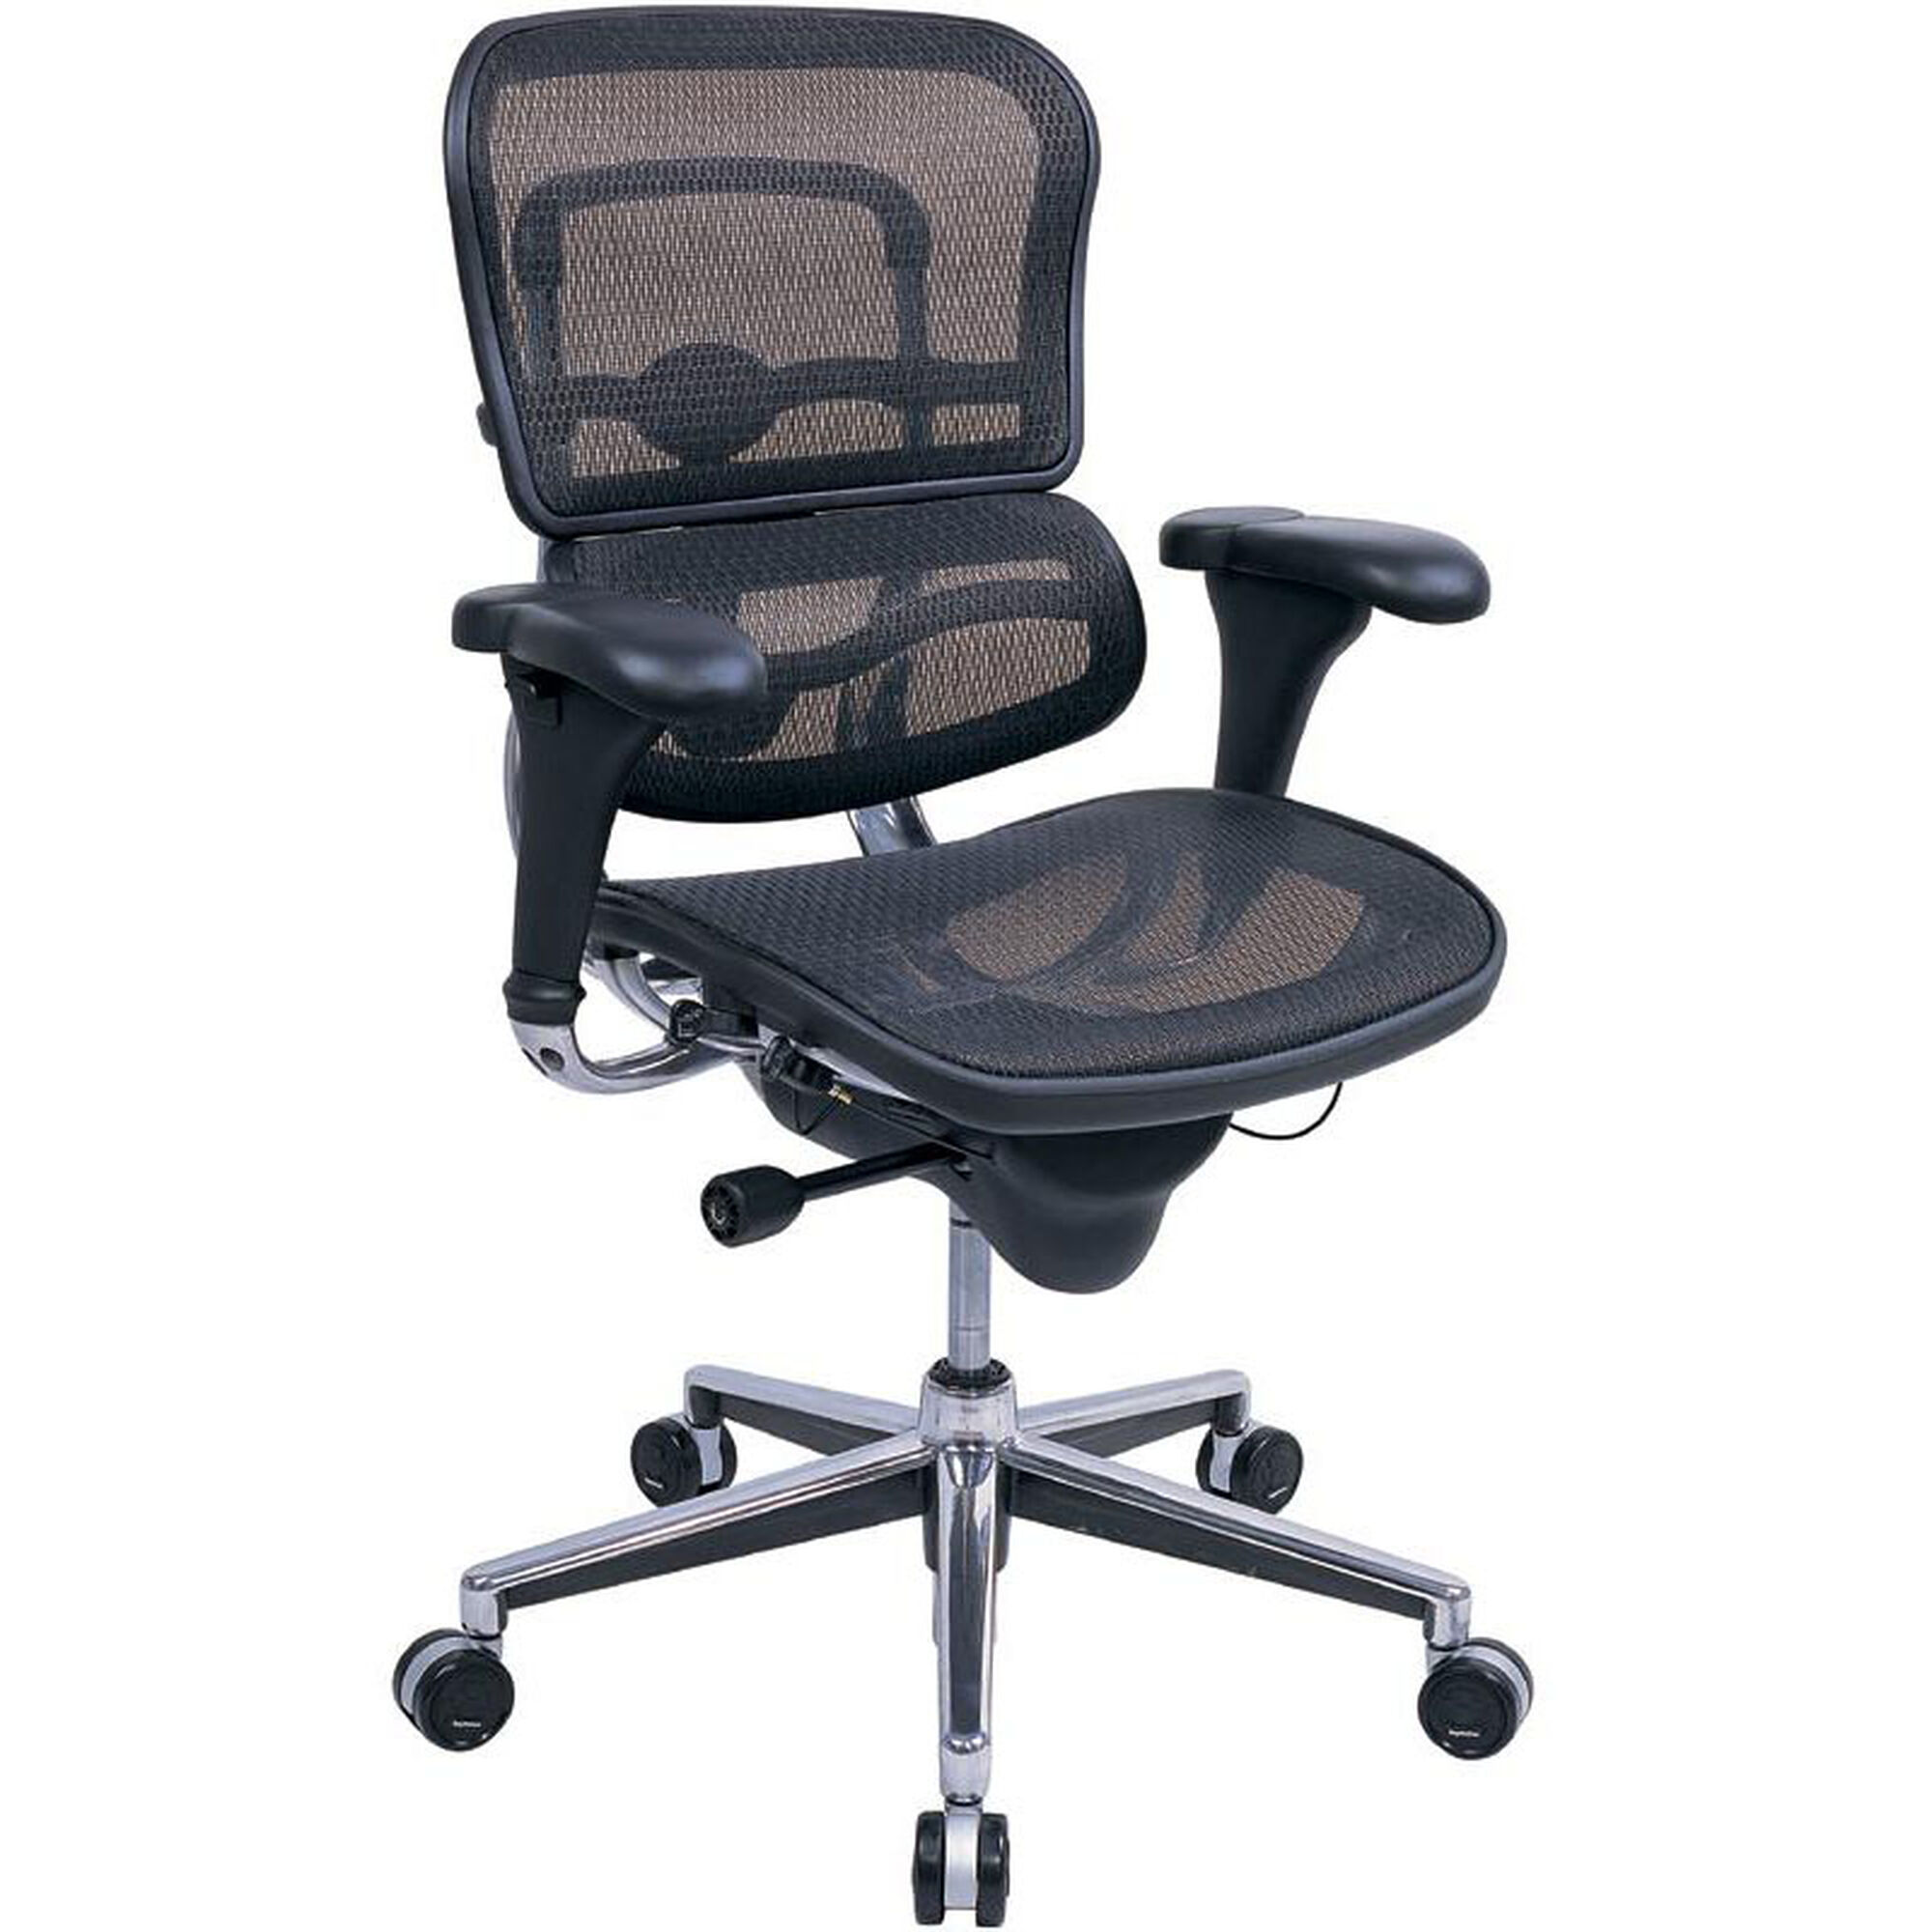 Ergohuman Series Mid Back 26 5 W X 29 D 39 H Adjule Height Mesh Office Chair Black